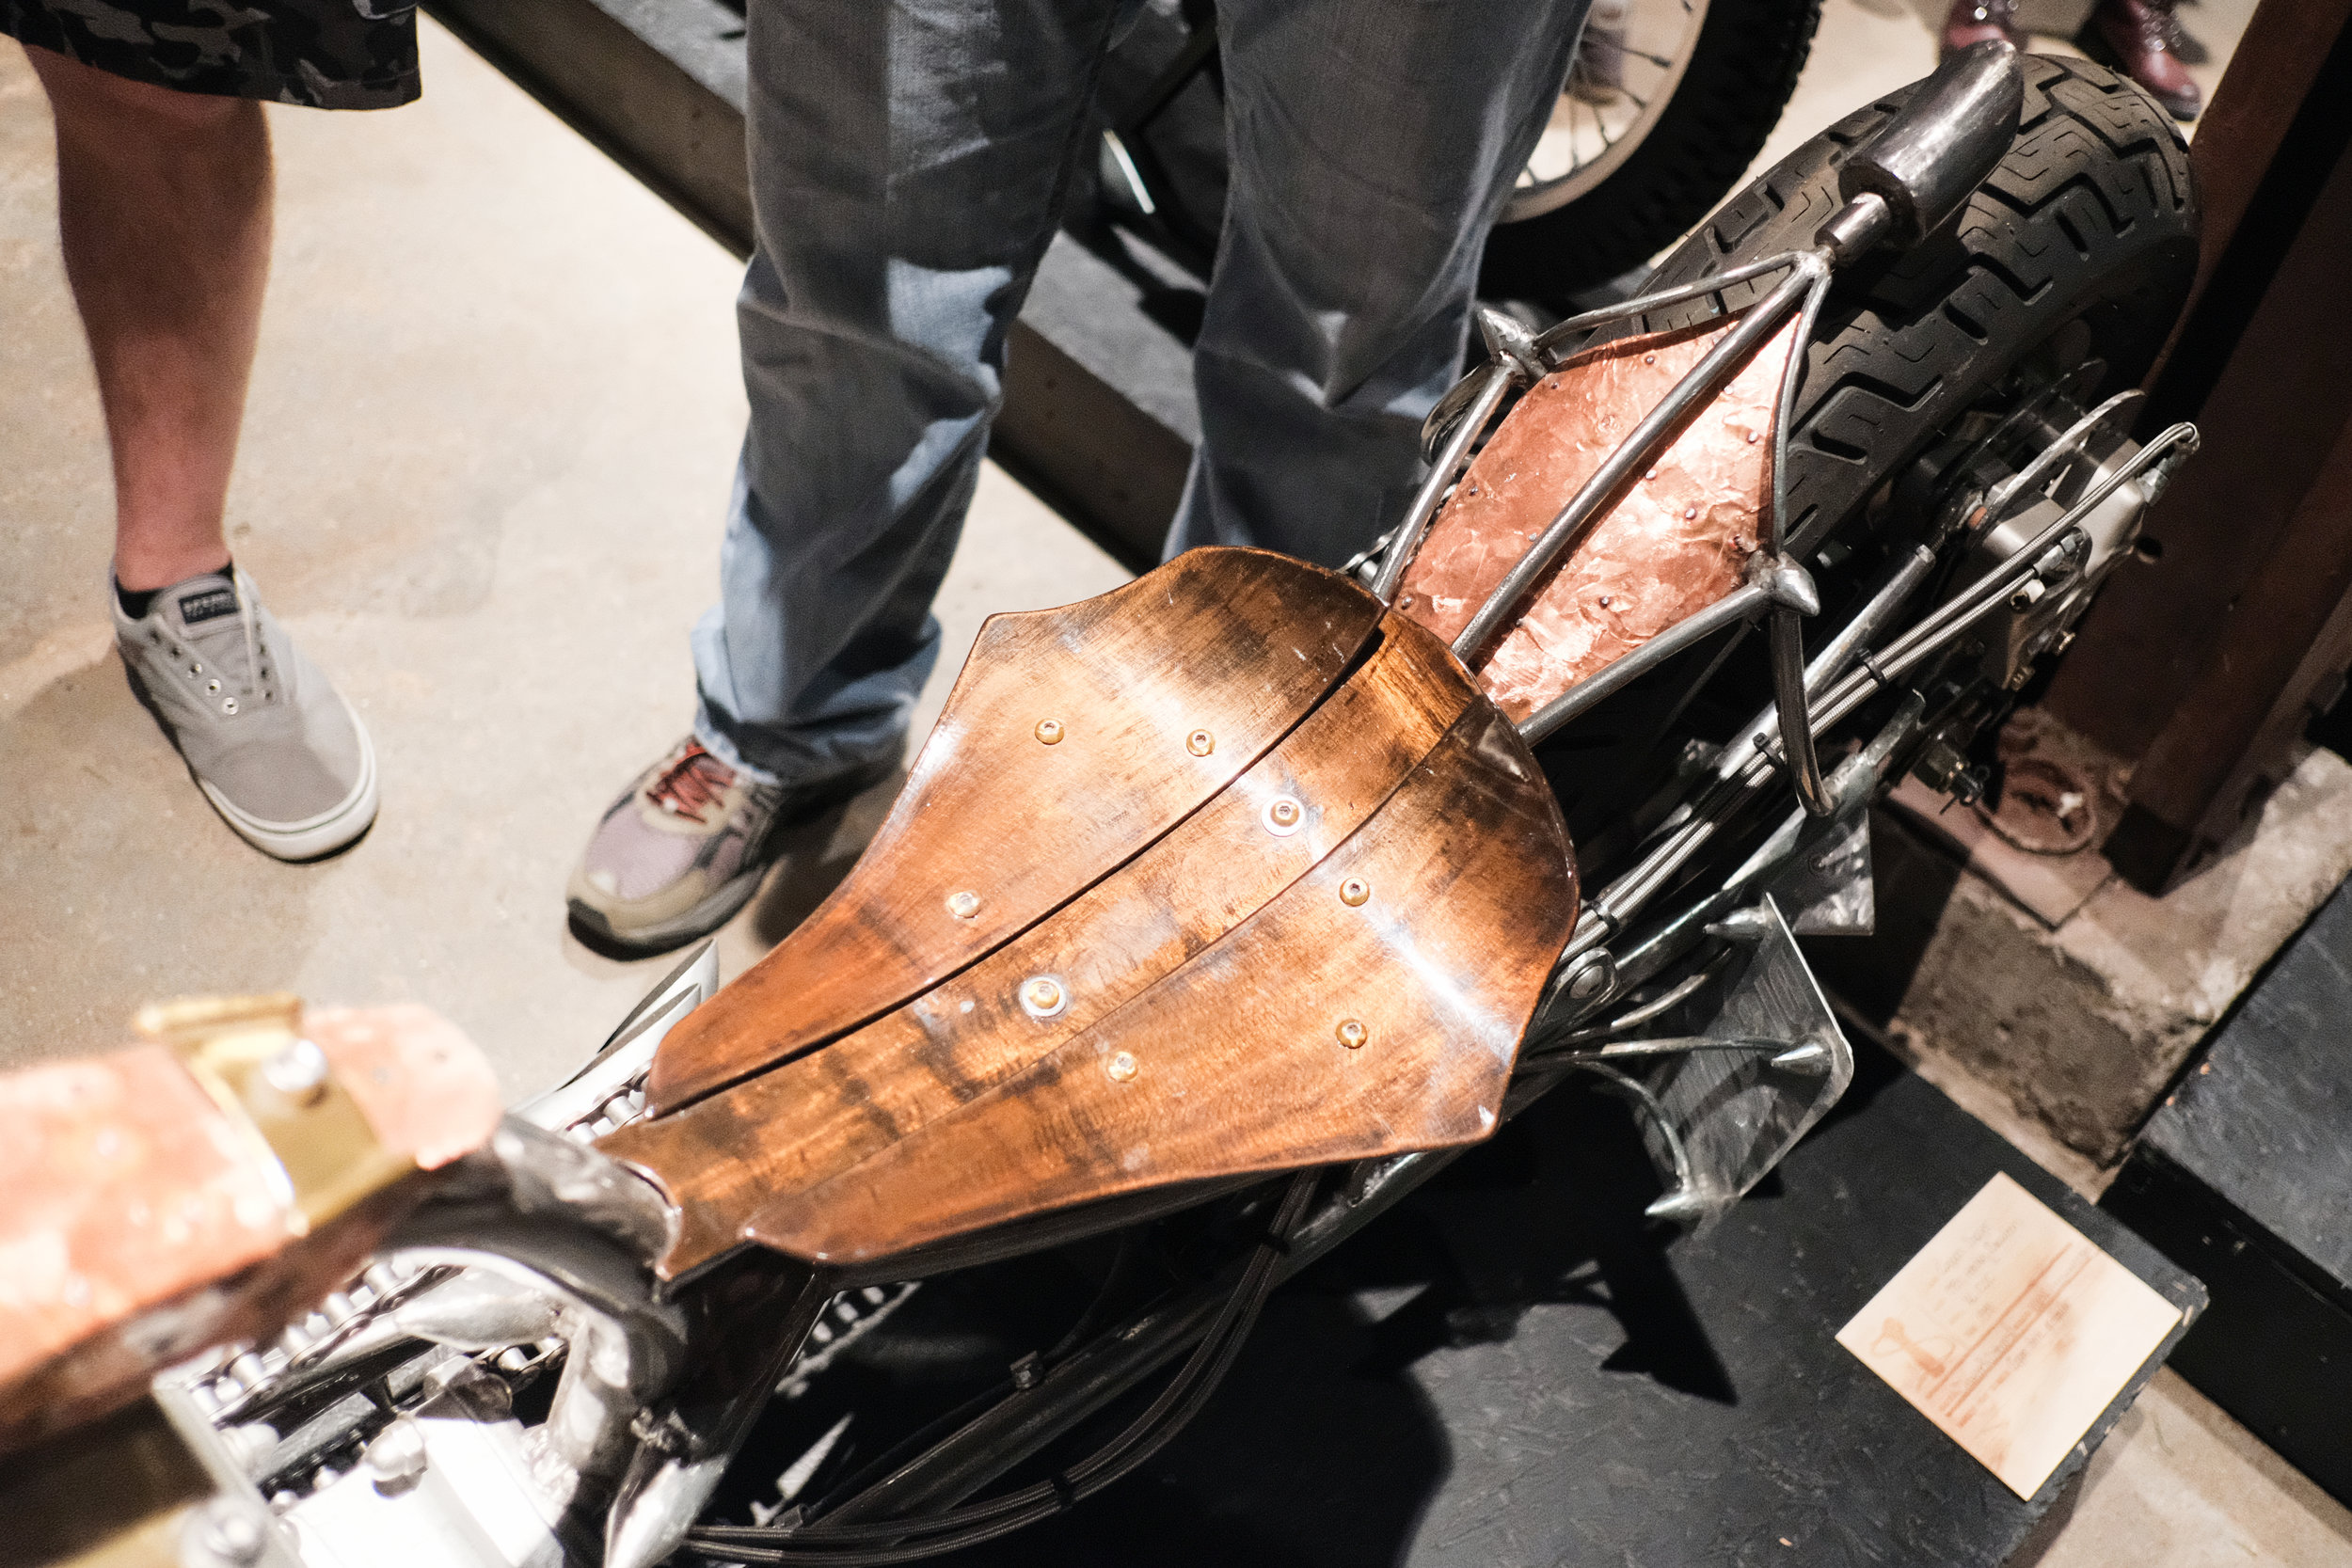 Handbuilt-Motorcycle-Show-2017-8513.jpg